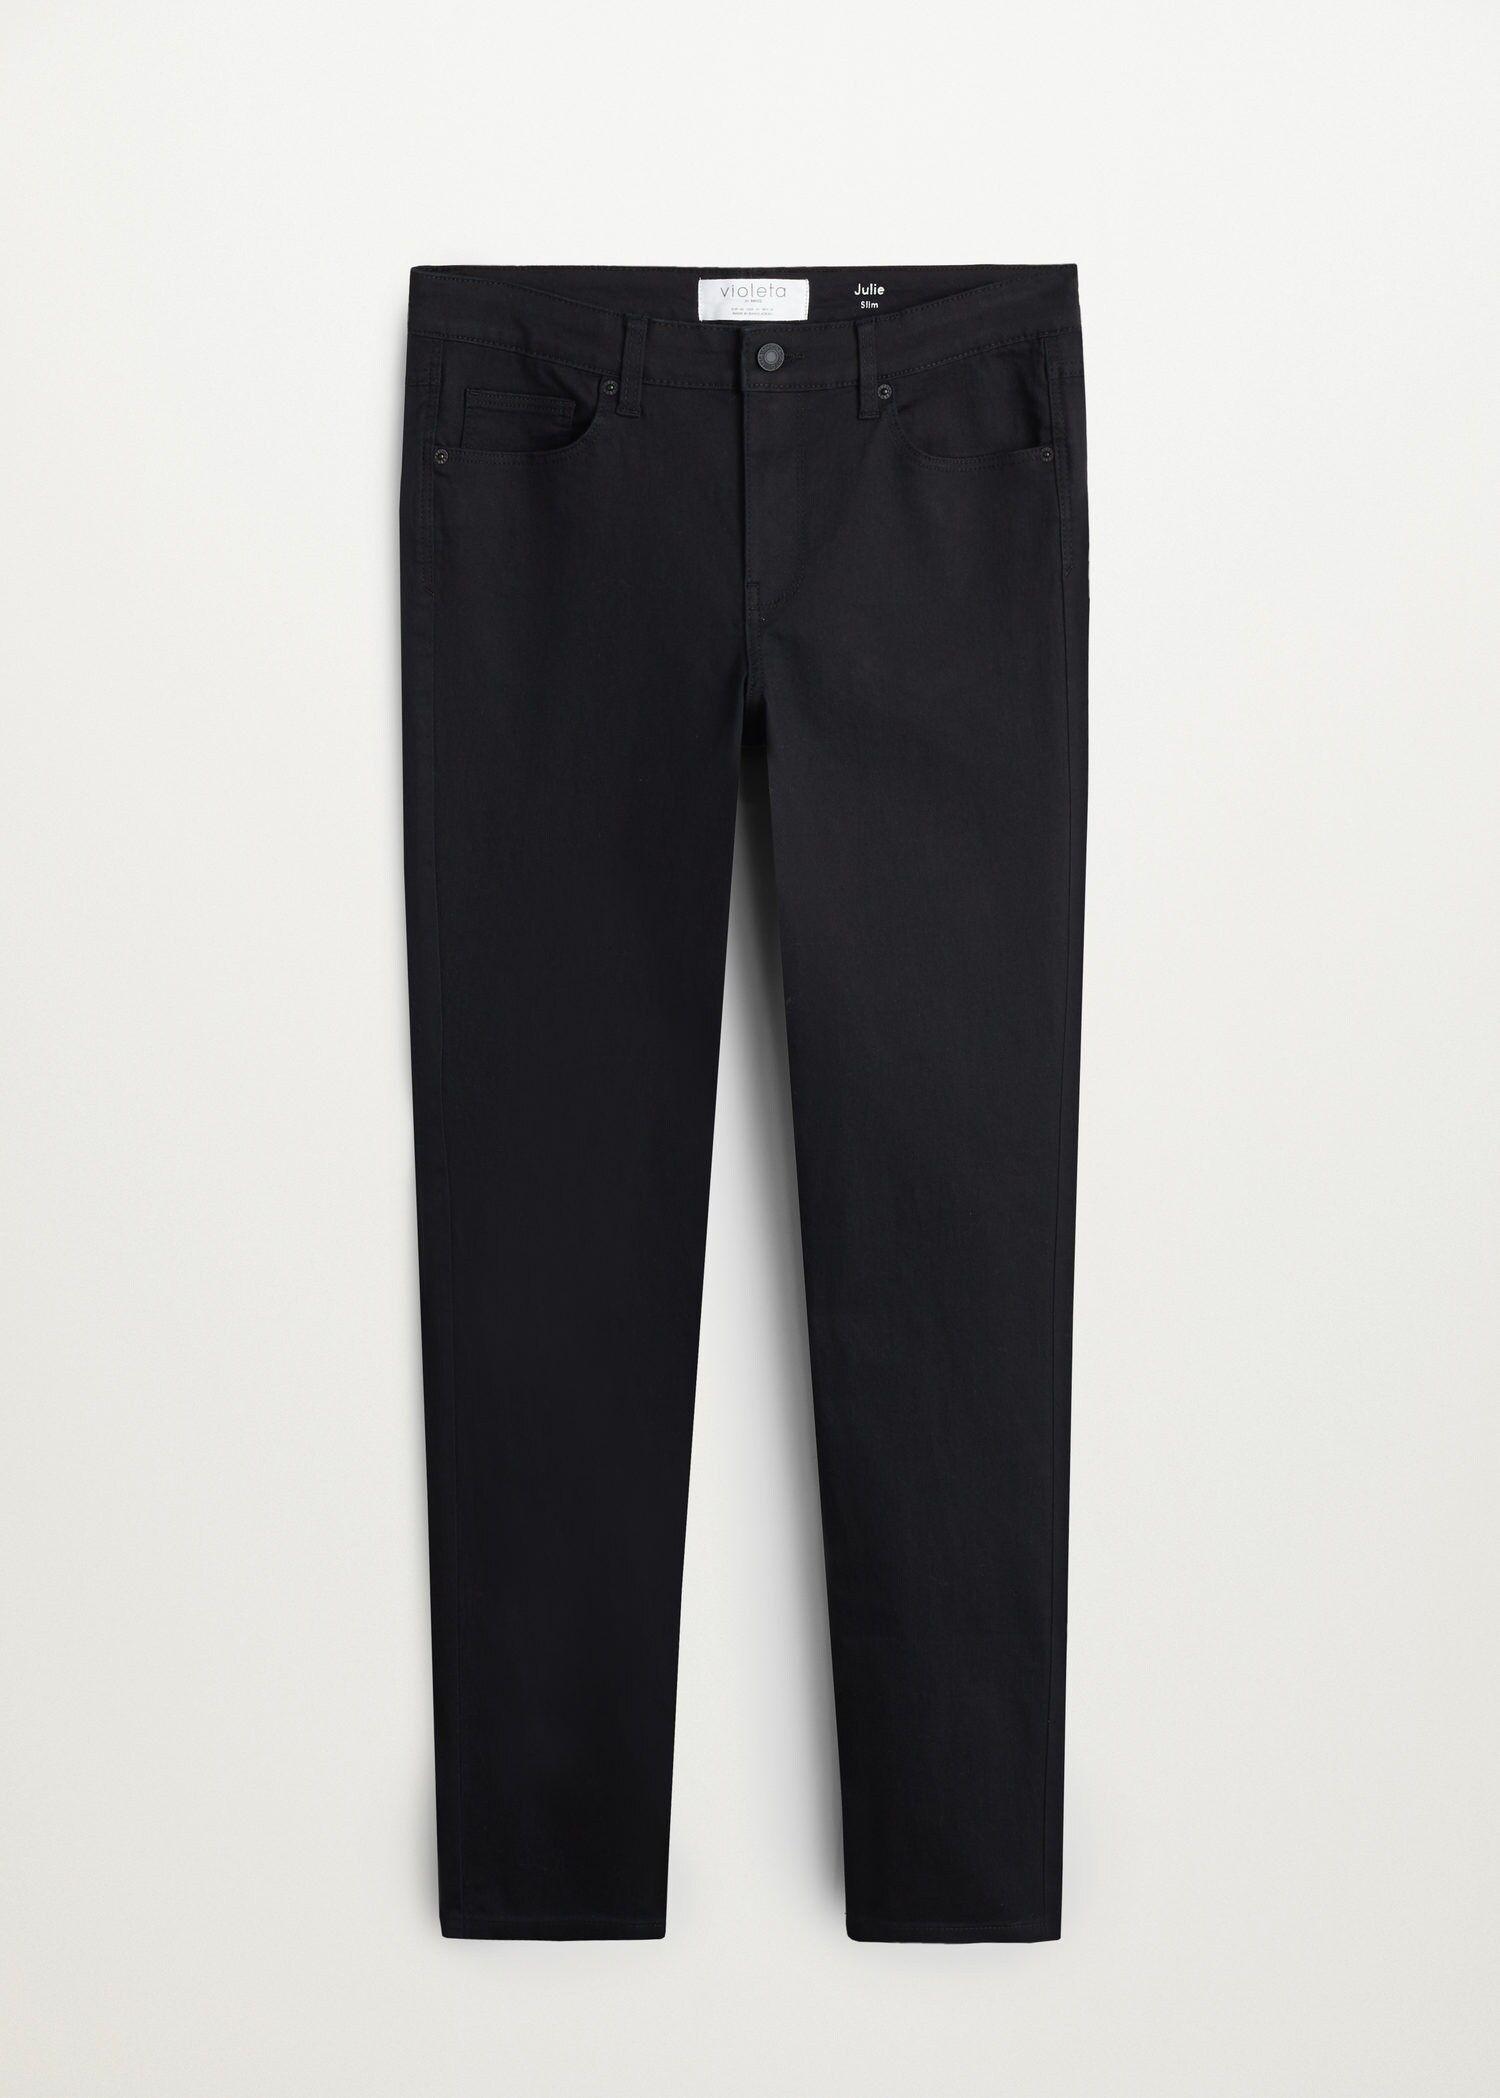 #PopbelaOOTD: Rekomendasi Celana Perempuan dengan Paha Besar